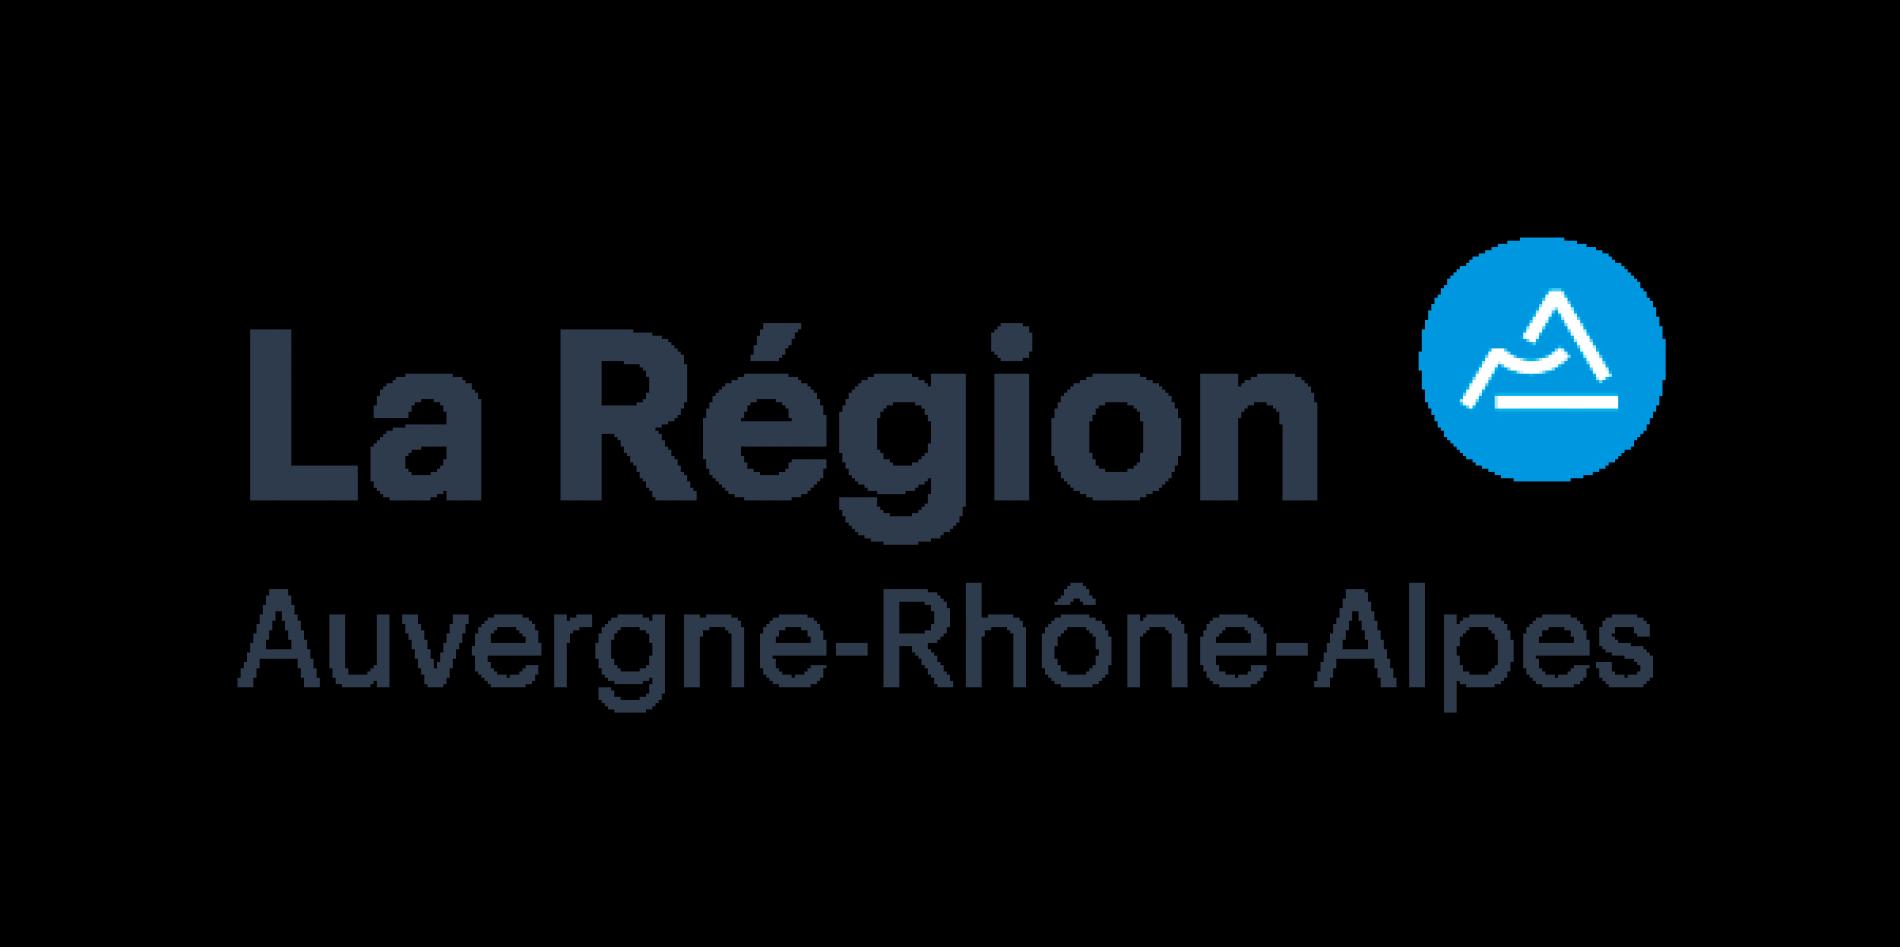 The Auvergne Rhône Alpes Region